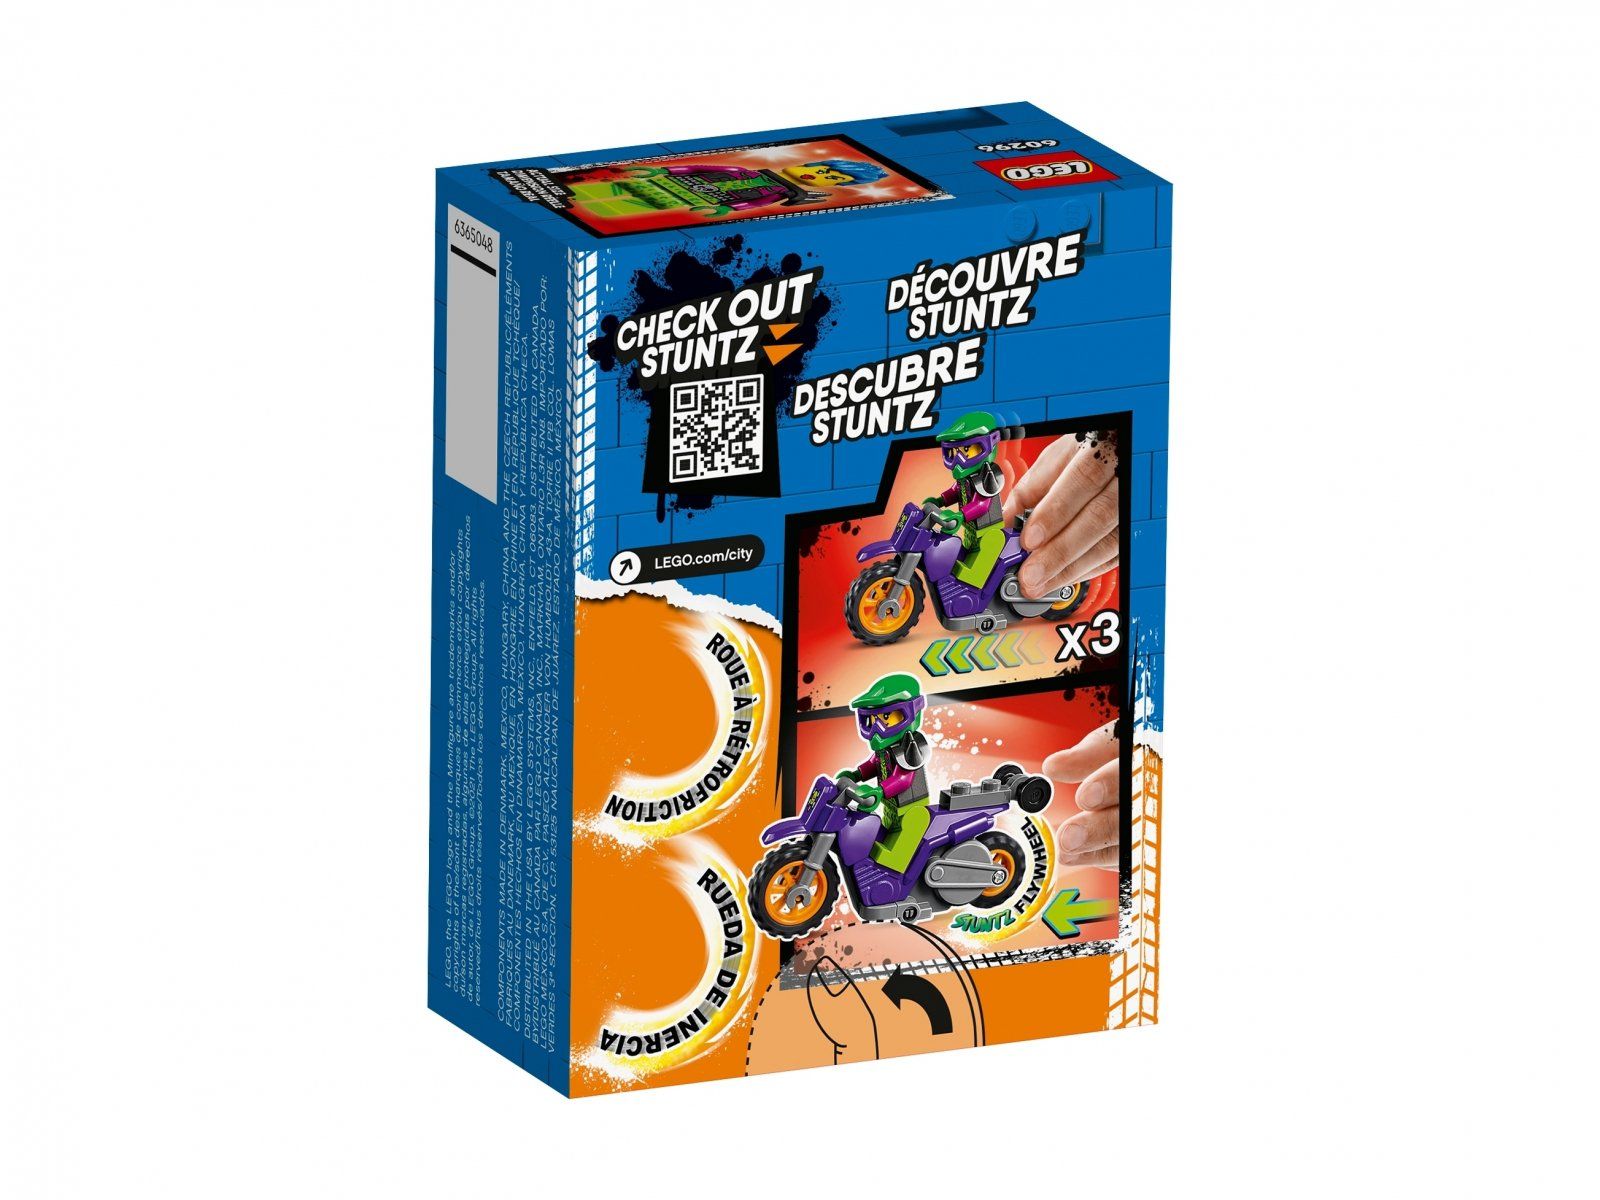 LEGO 60296 City Wheelie na motocyklu kaskaderskim